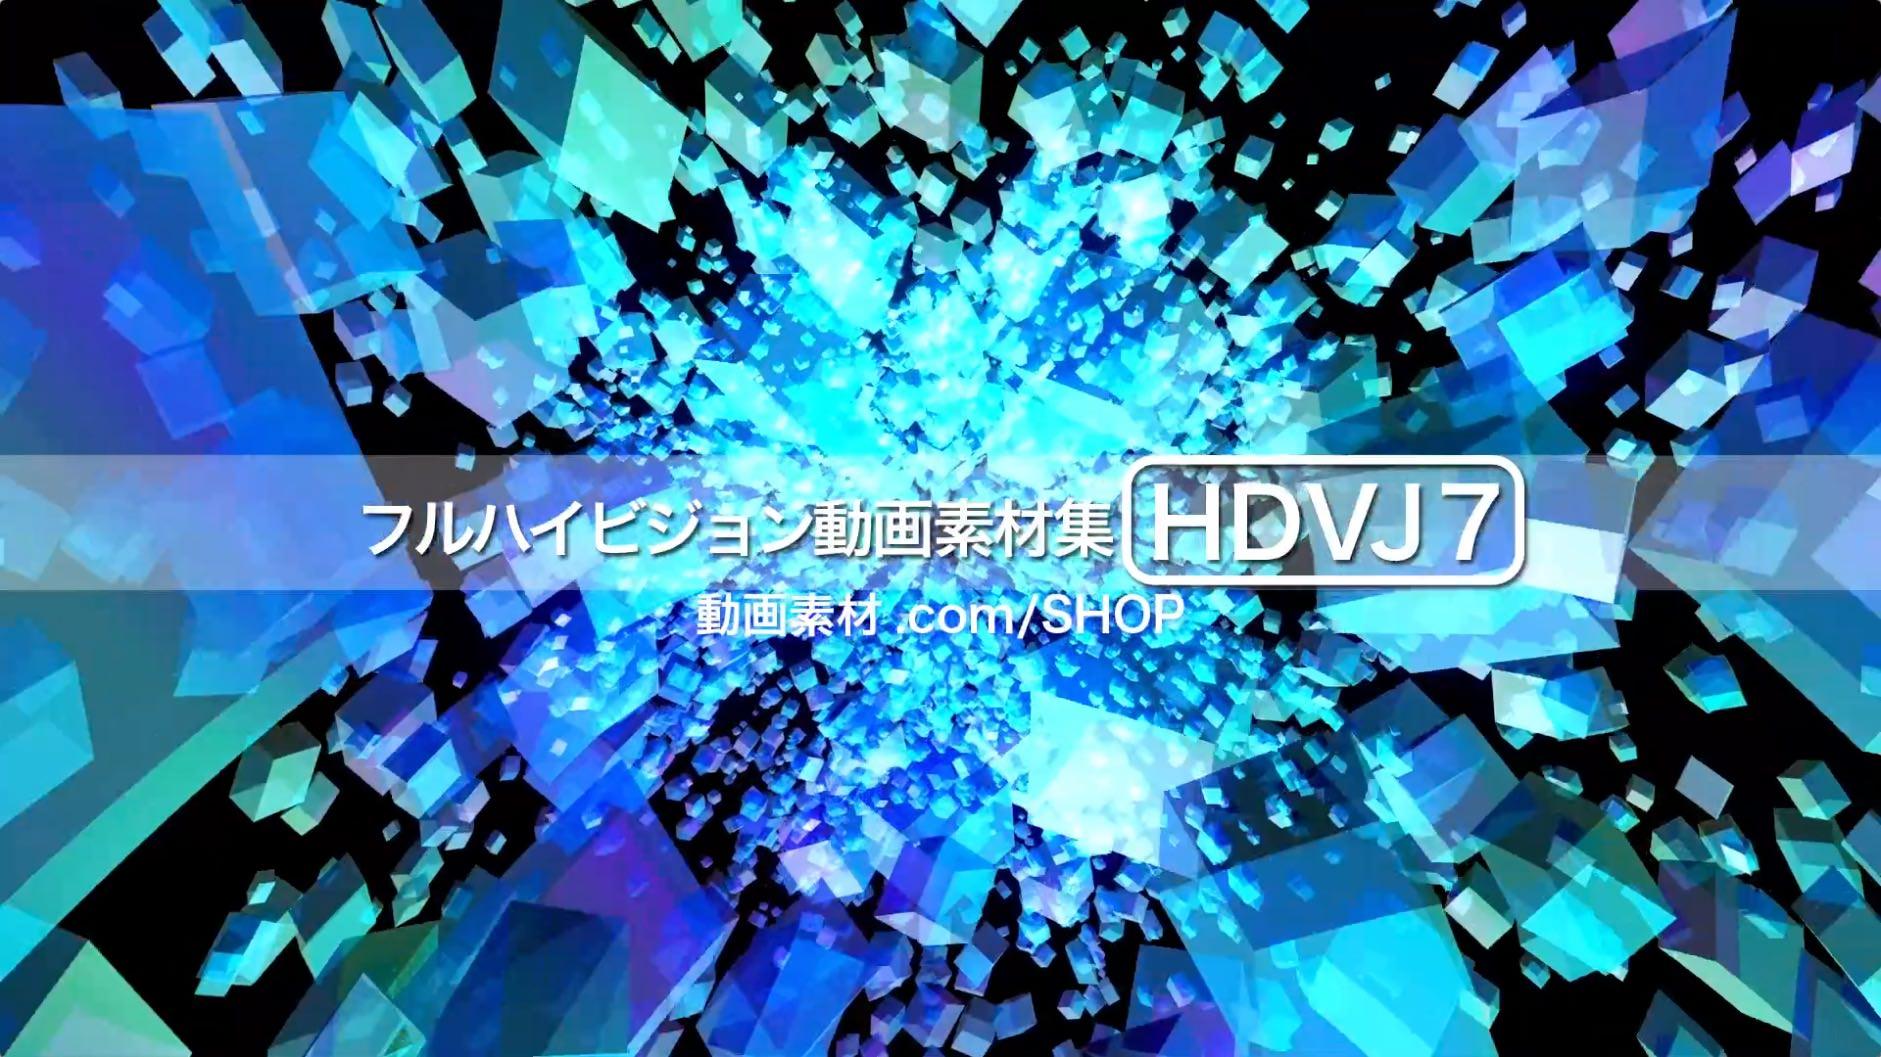 MovieMaterial HDVJ7 フルハイビジョンVJ動画素材集 画像3